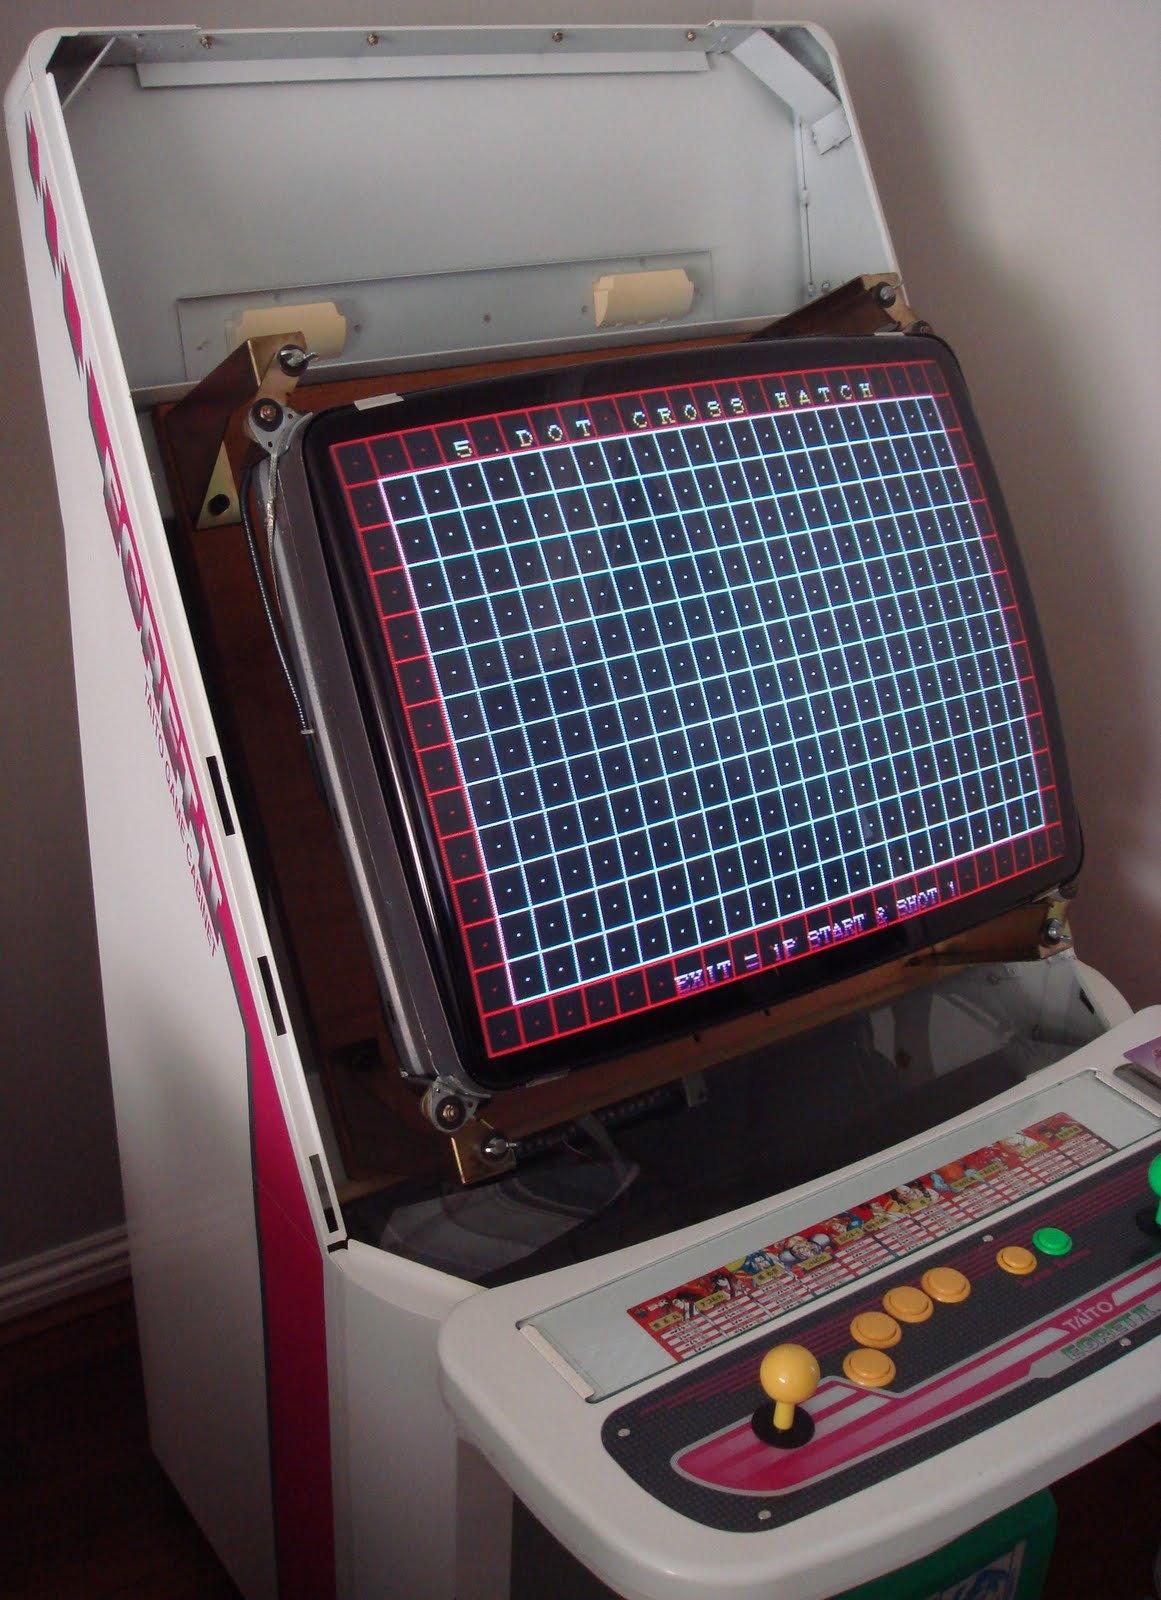 Une borne d 39 arcade maison 13 - Borne d arcade maison ...